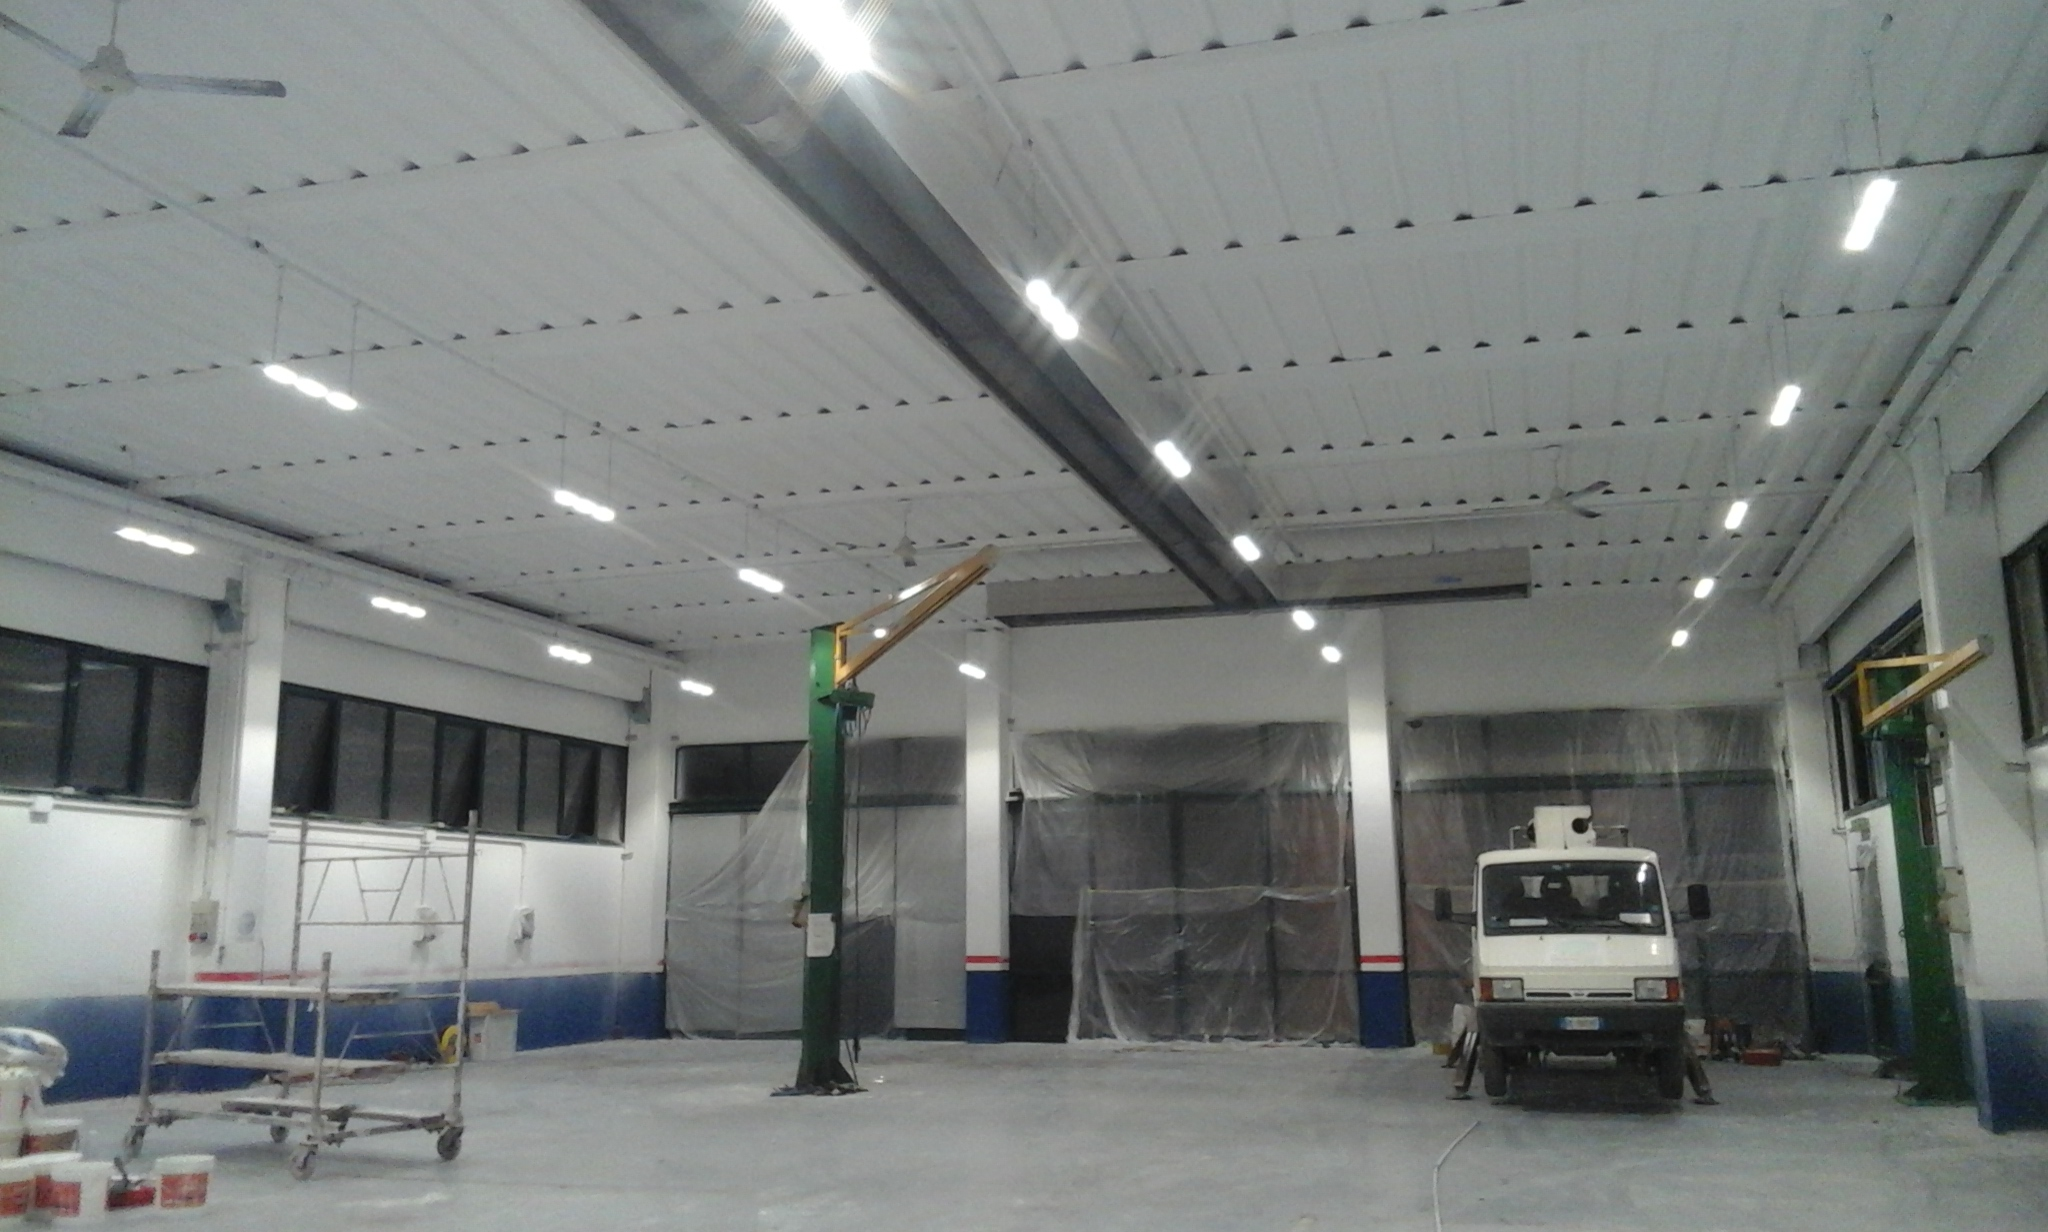 Illuminazione Capannone Industriale